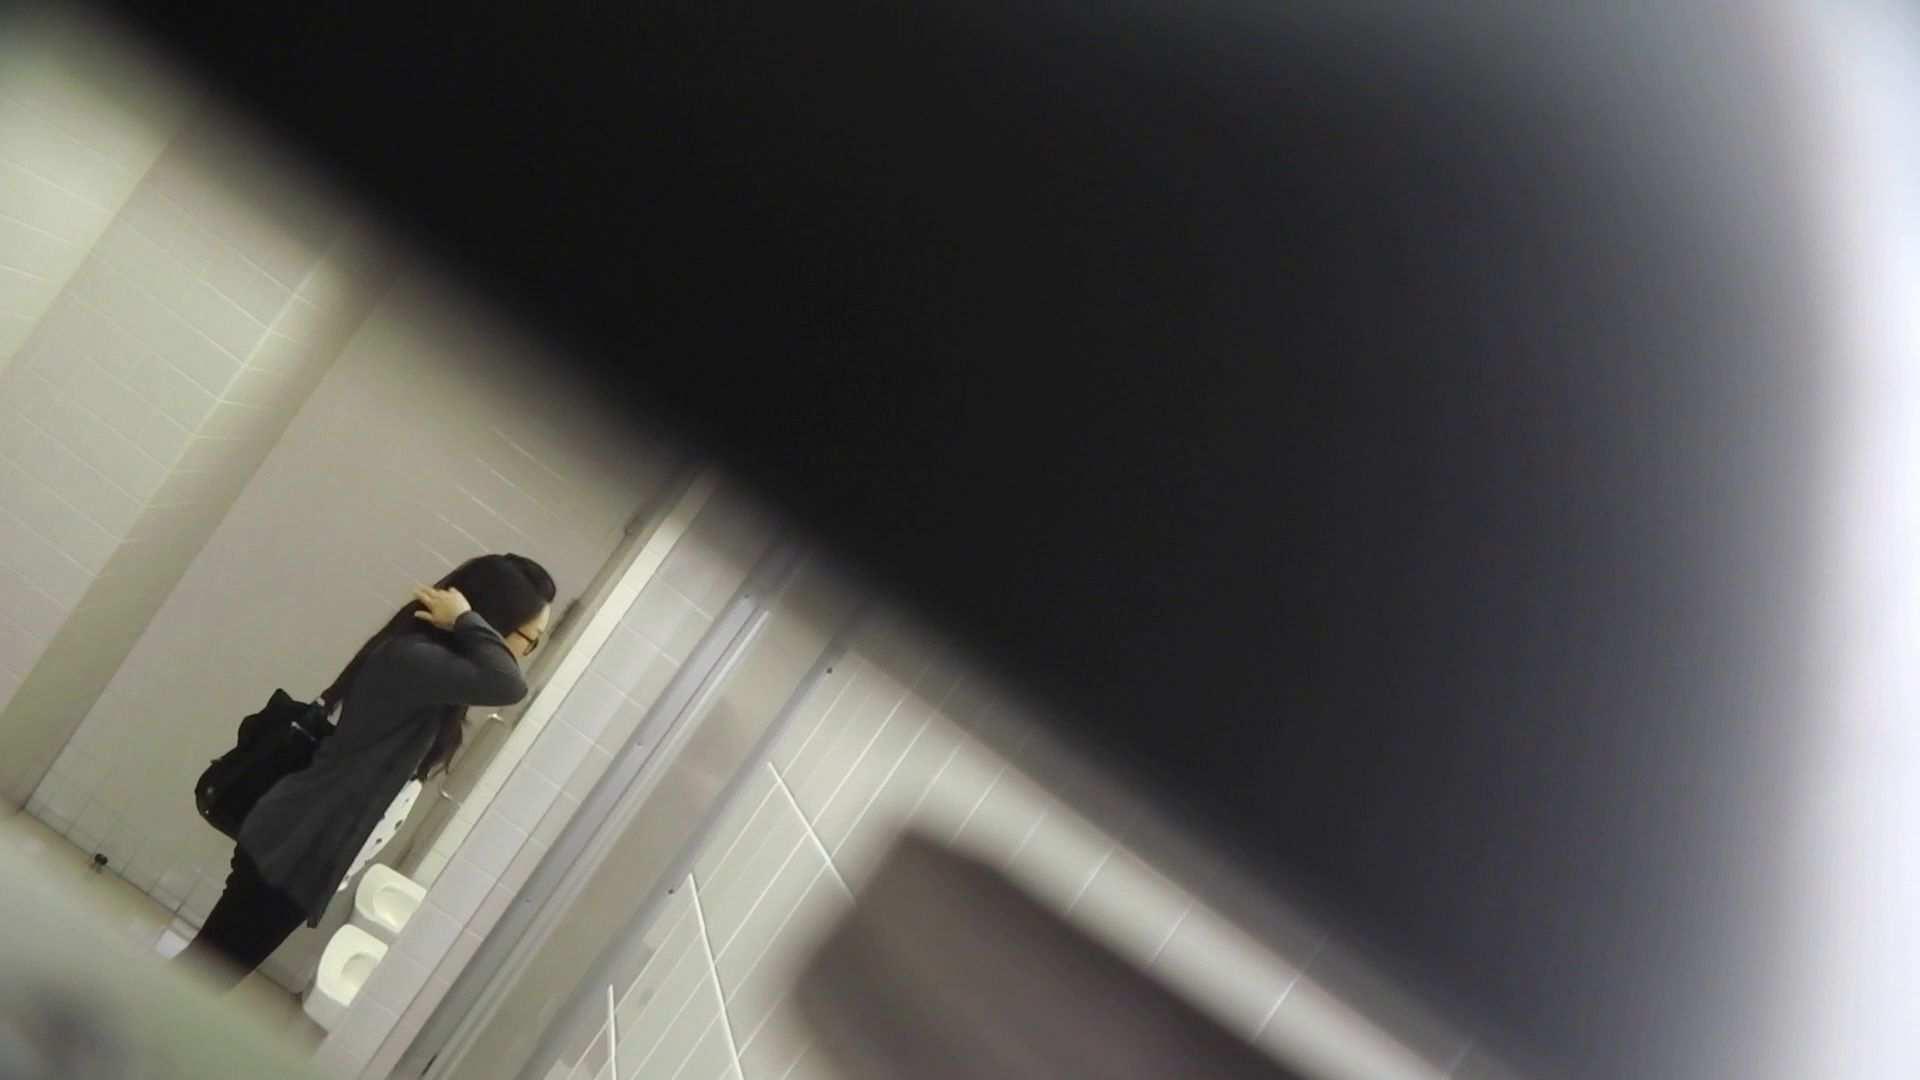 vol.10 命がけ潜伏洗面所! バックからヒクヒク。 OL女体 | プライベート  54連発 41